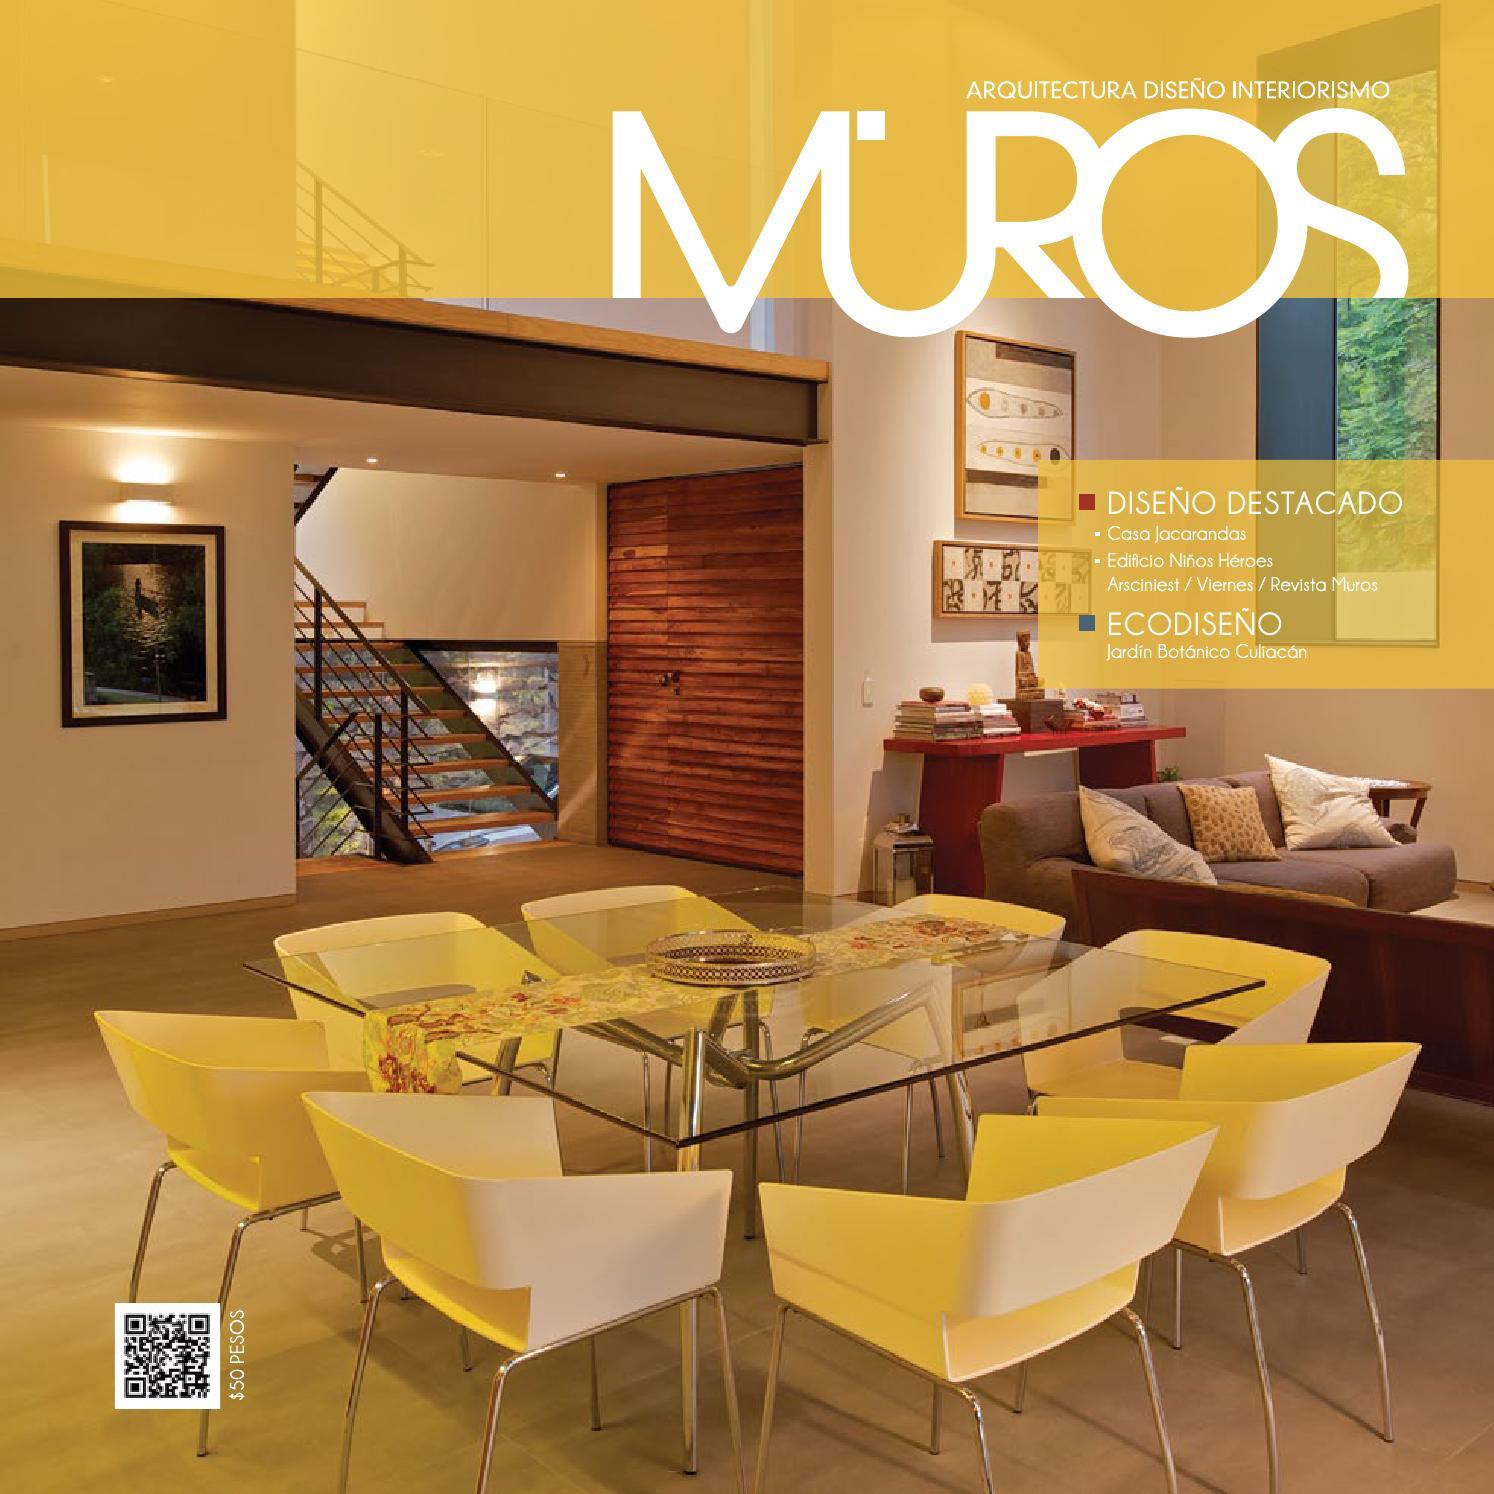 Edici n 9 revista muros arquitectura dise o interiorismo for Revista arquitectura y diseno